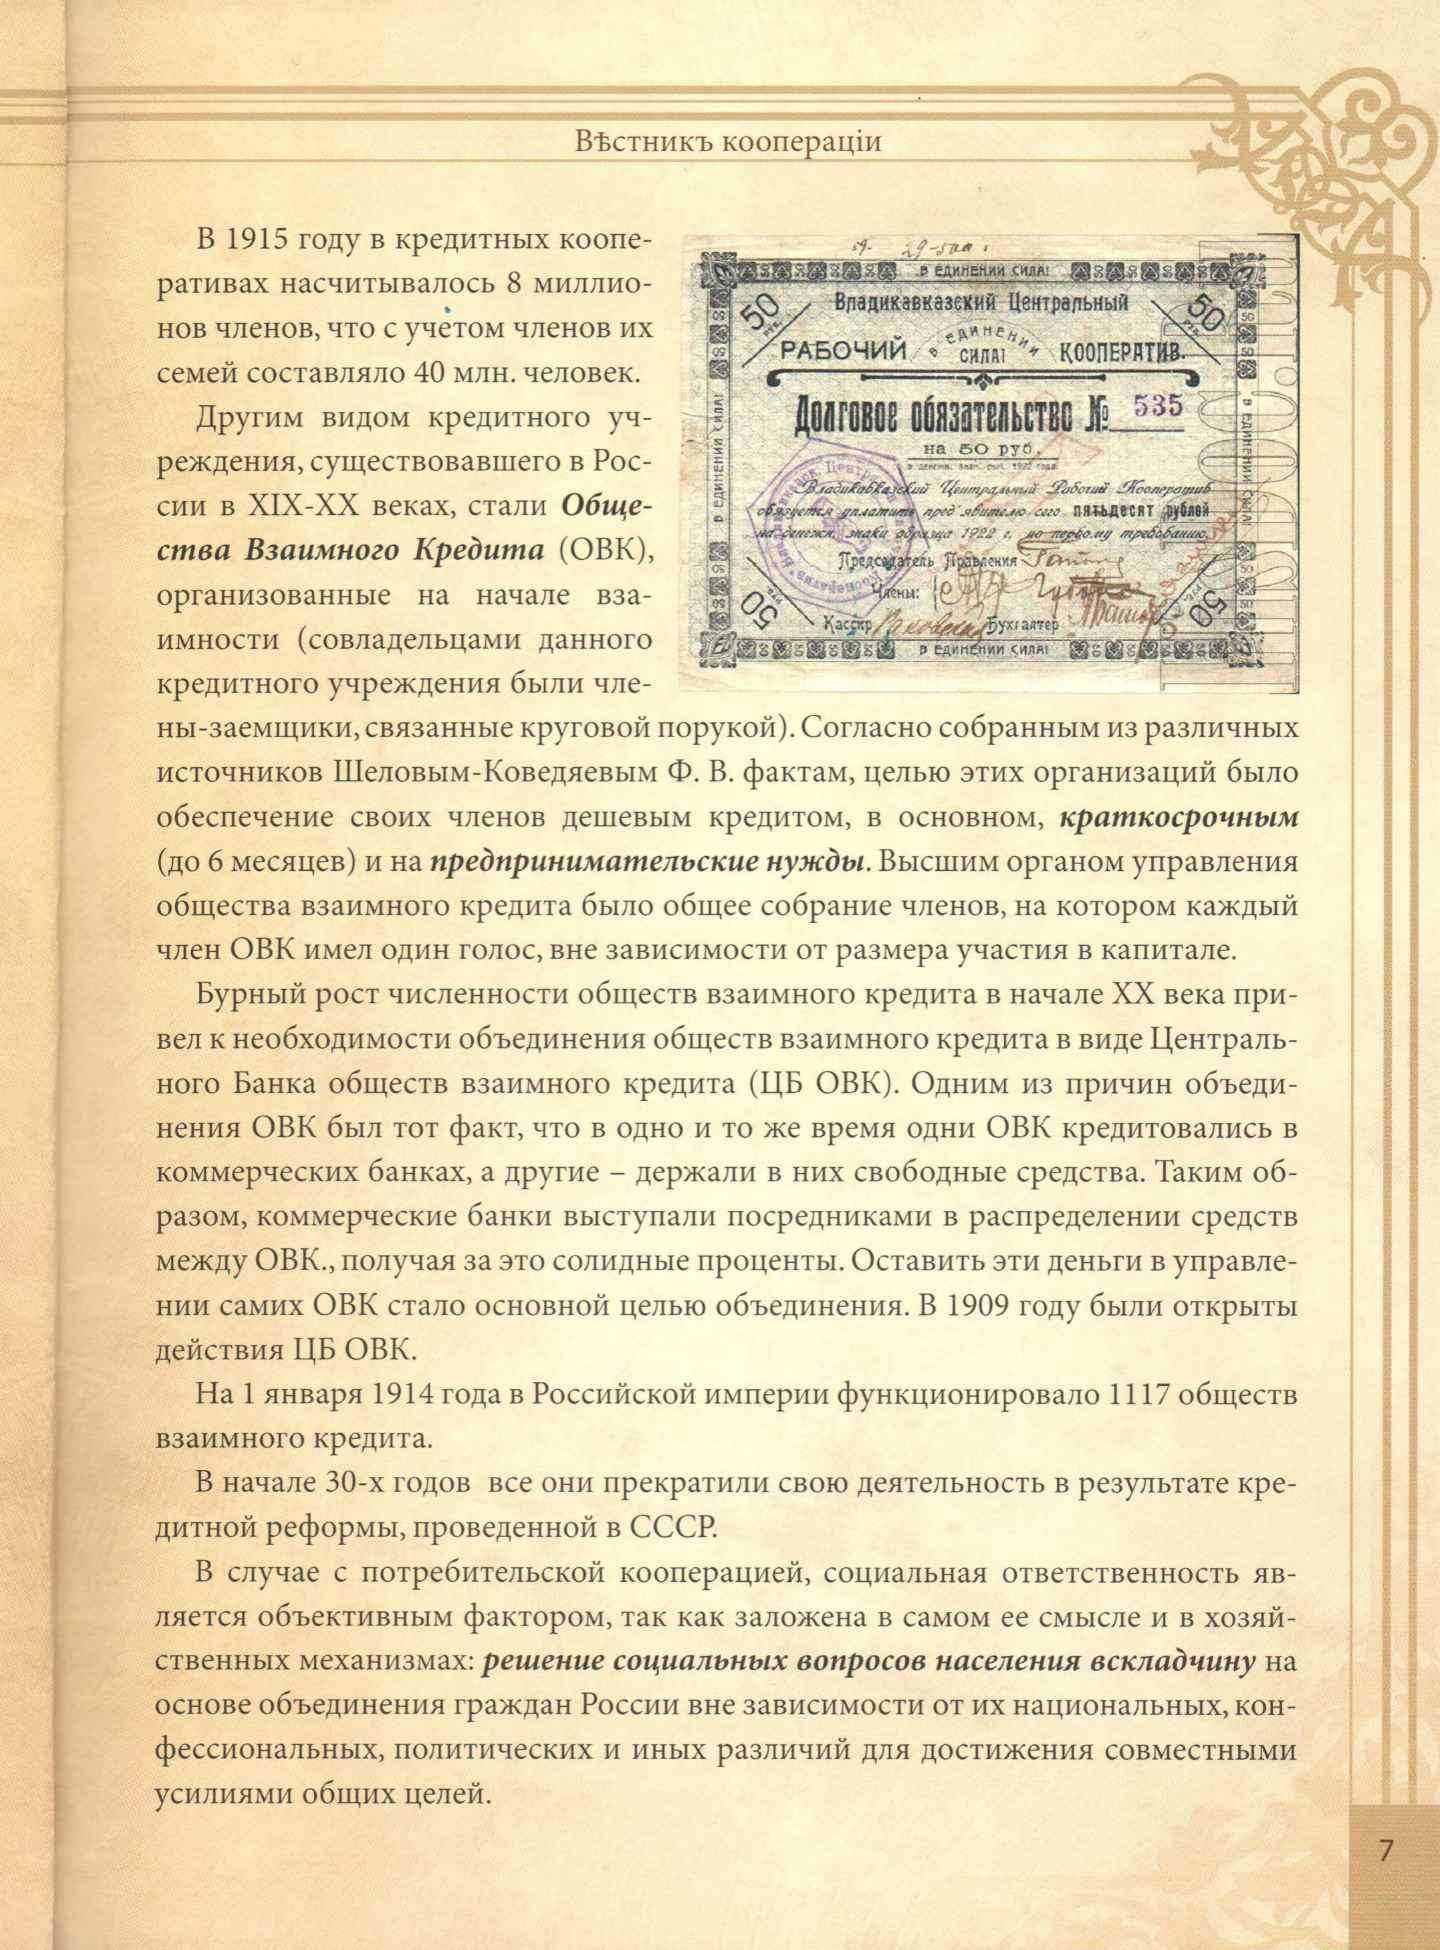 Вестник кооперации-7